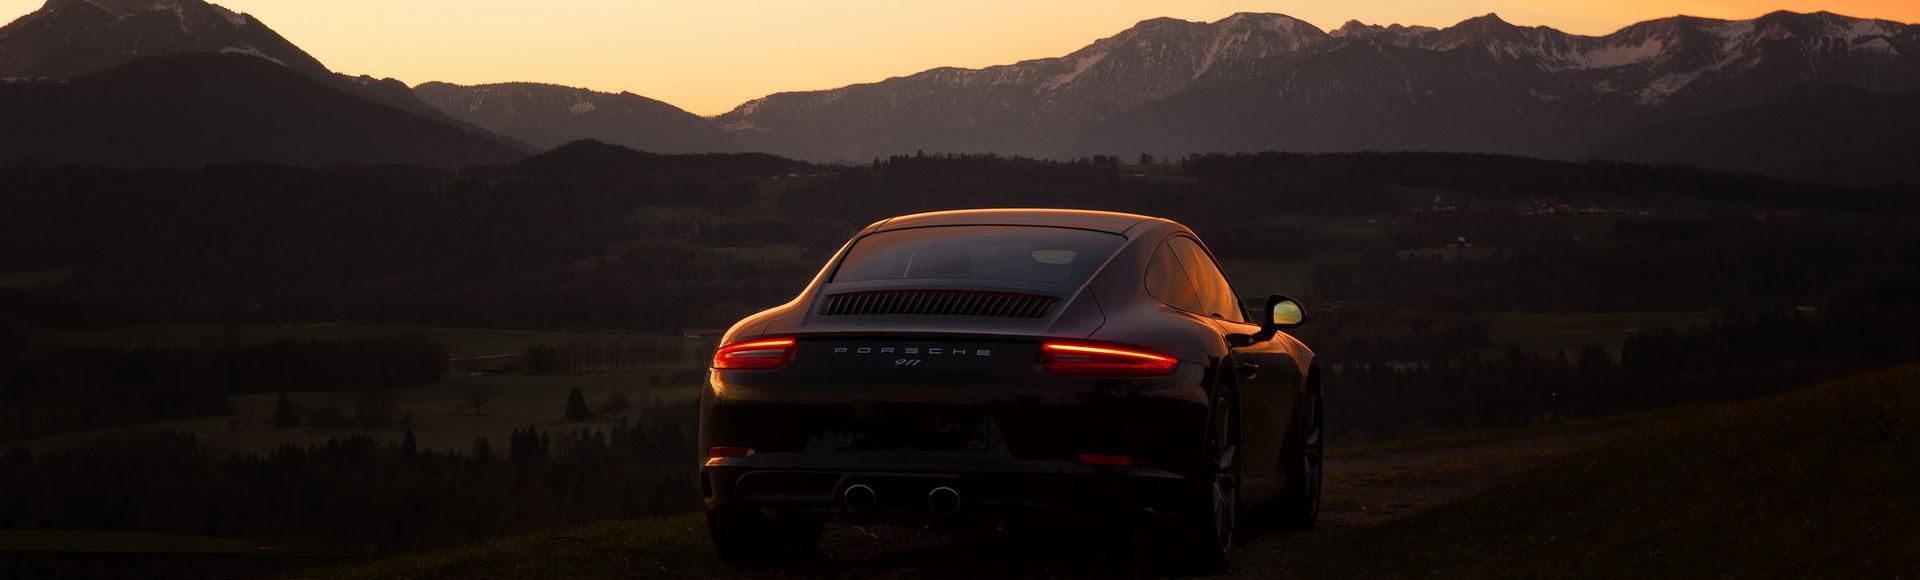 Porsche 911 991 Coupe 2016 Herbst 166